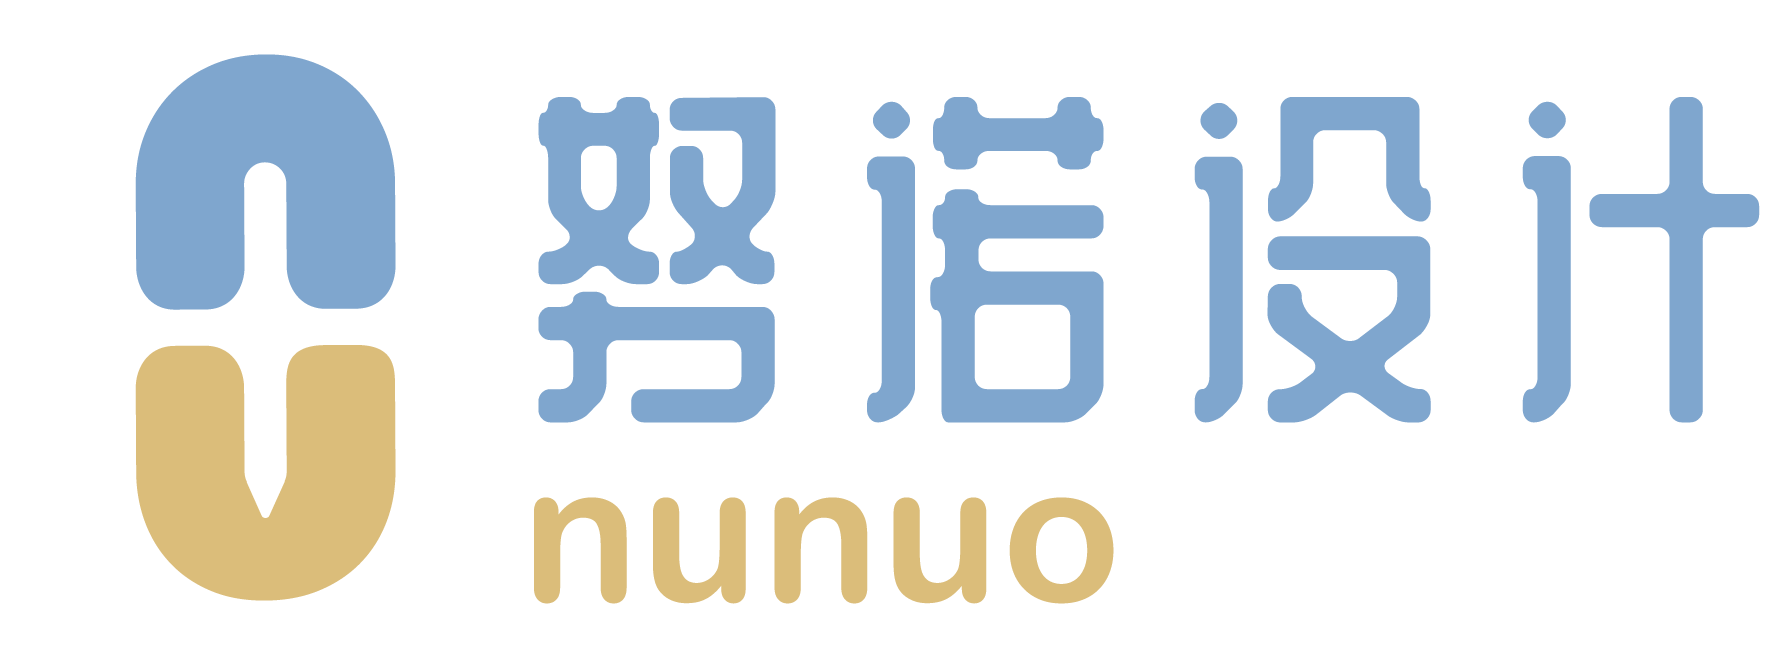 Nunuo